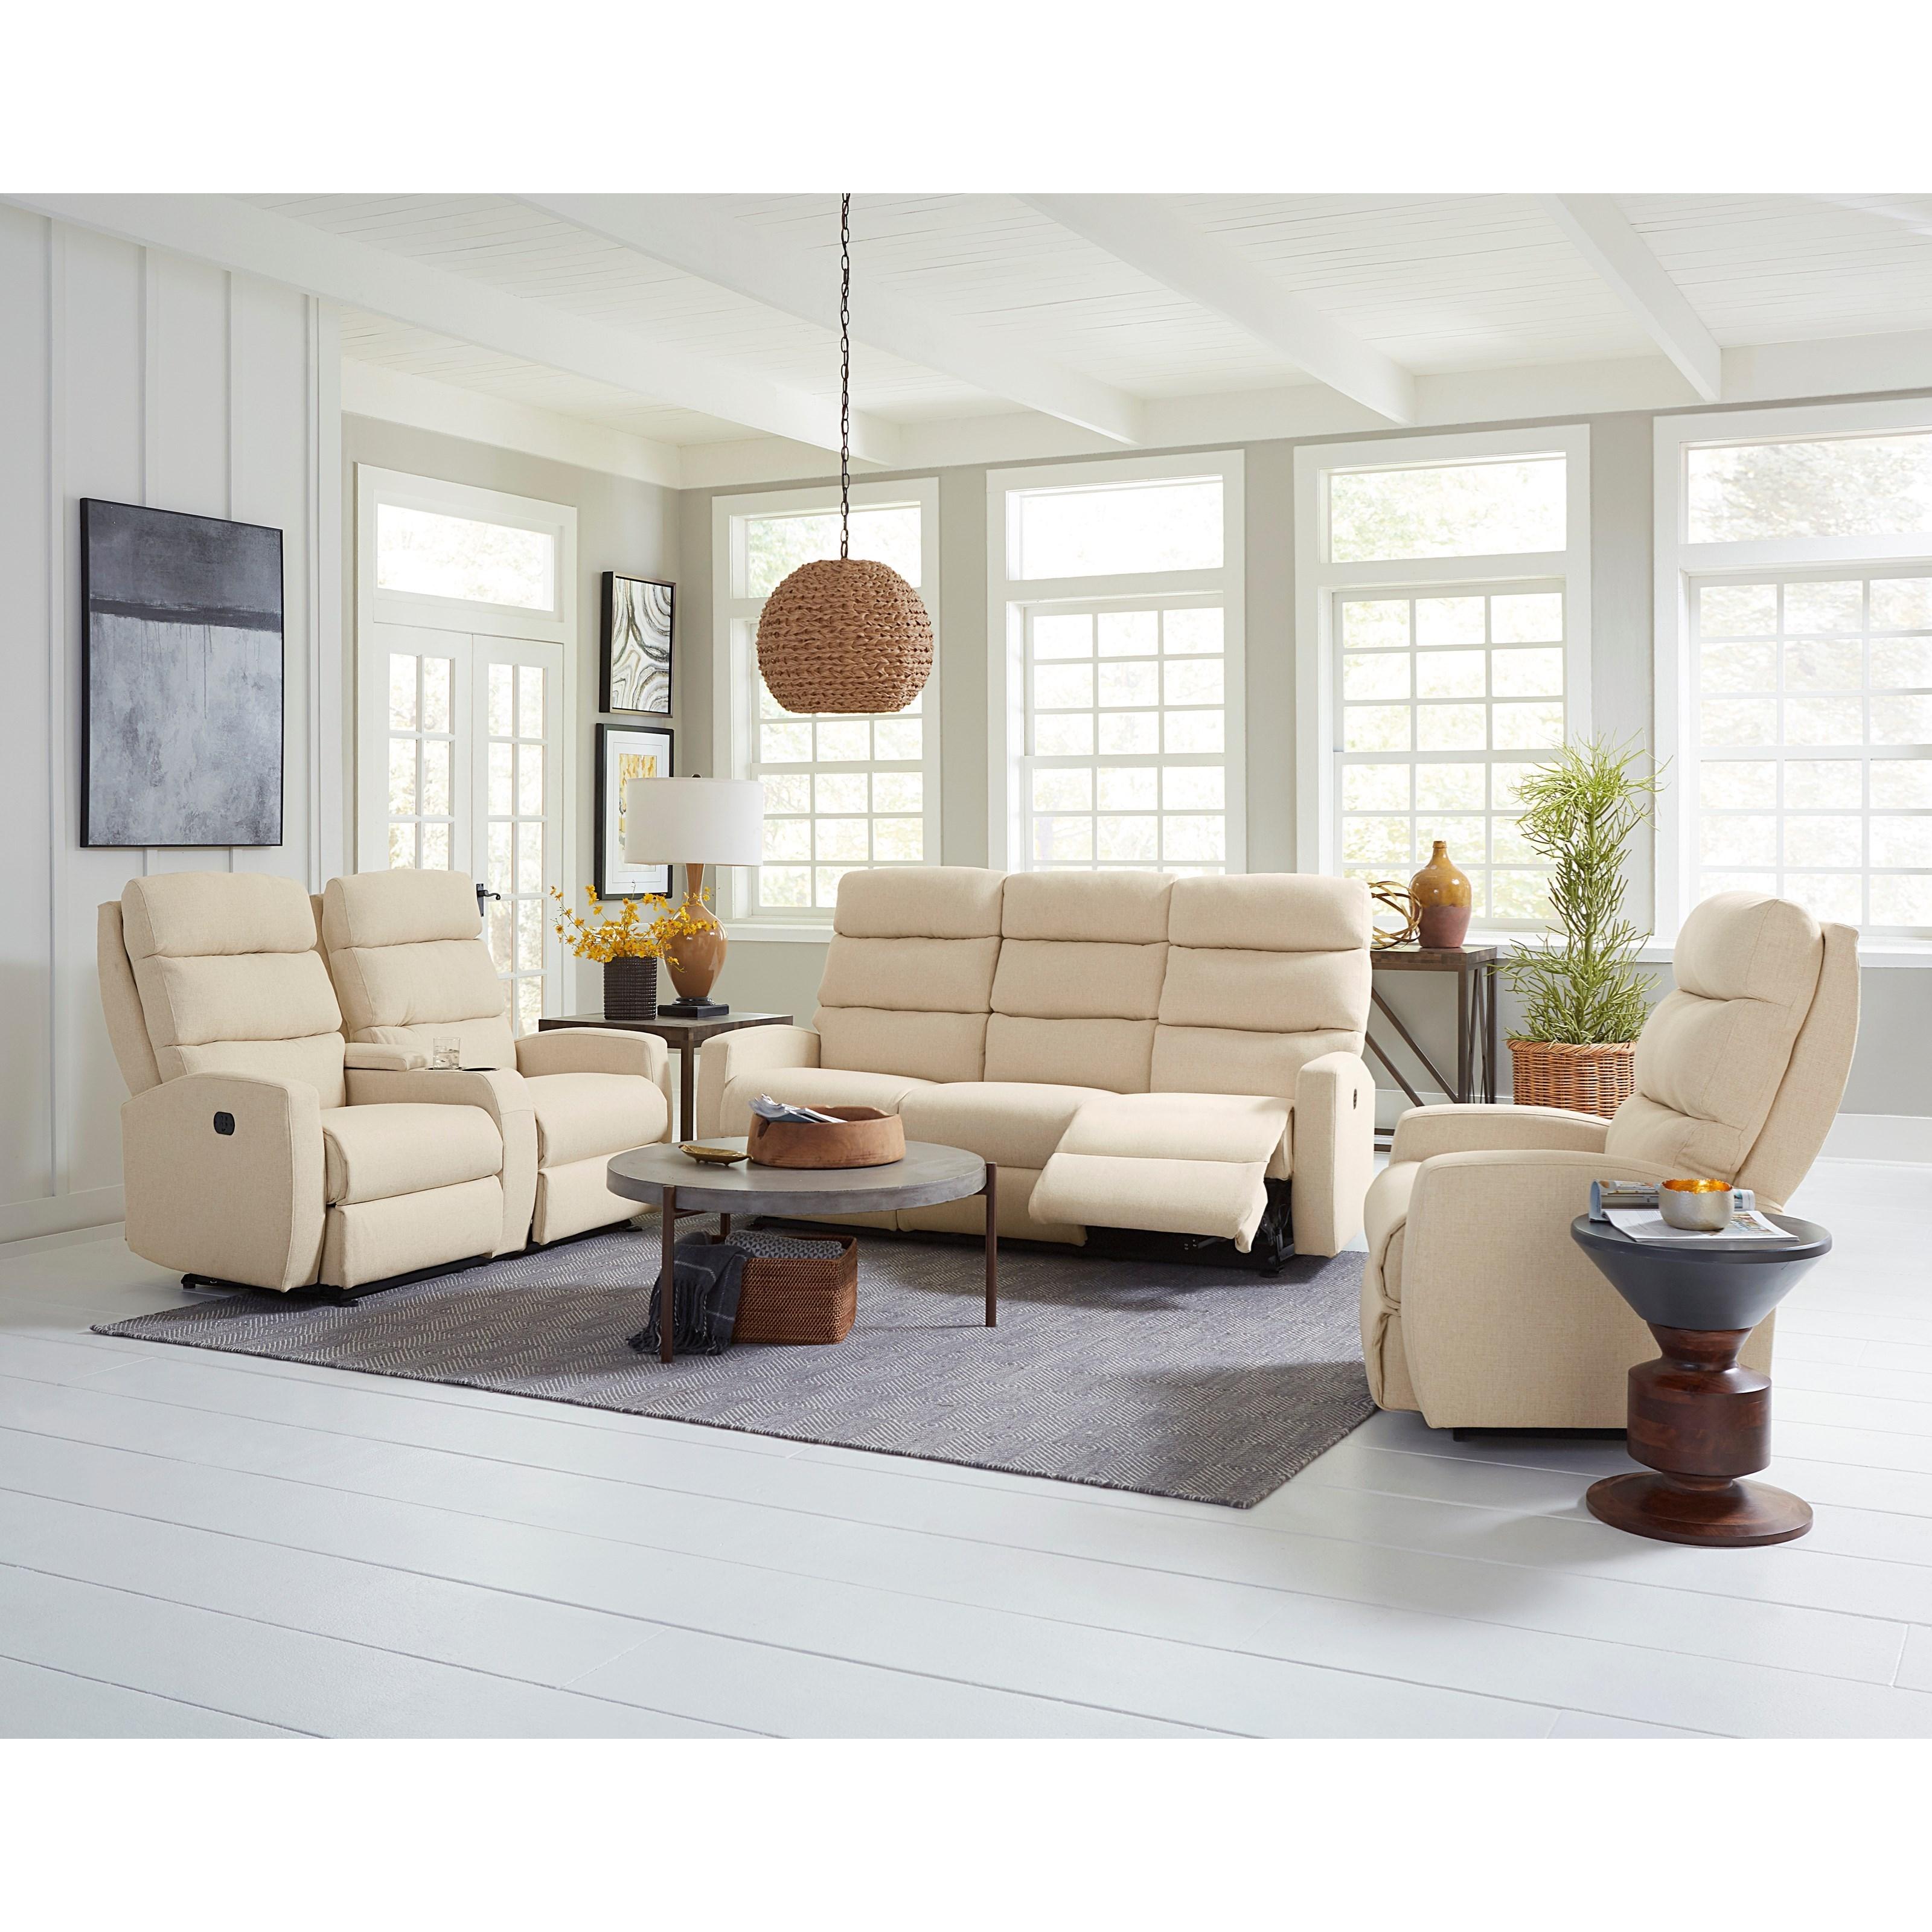 Best Home Furnishings Hillarie L615rc4 Reclining Wall